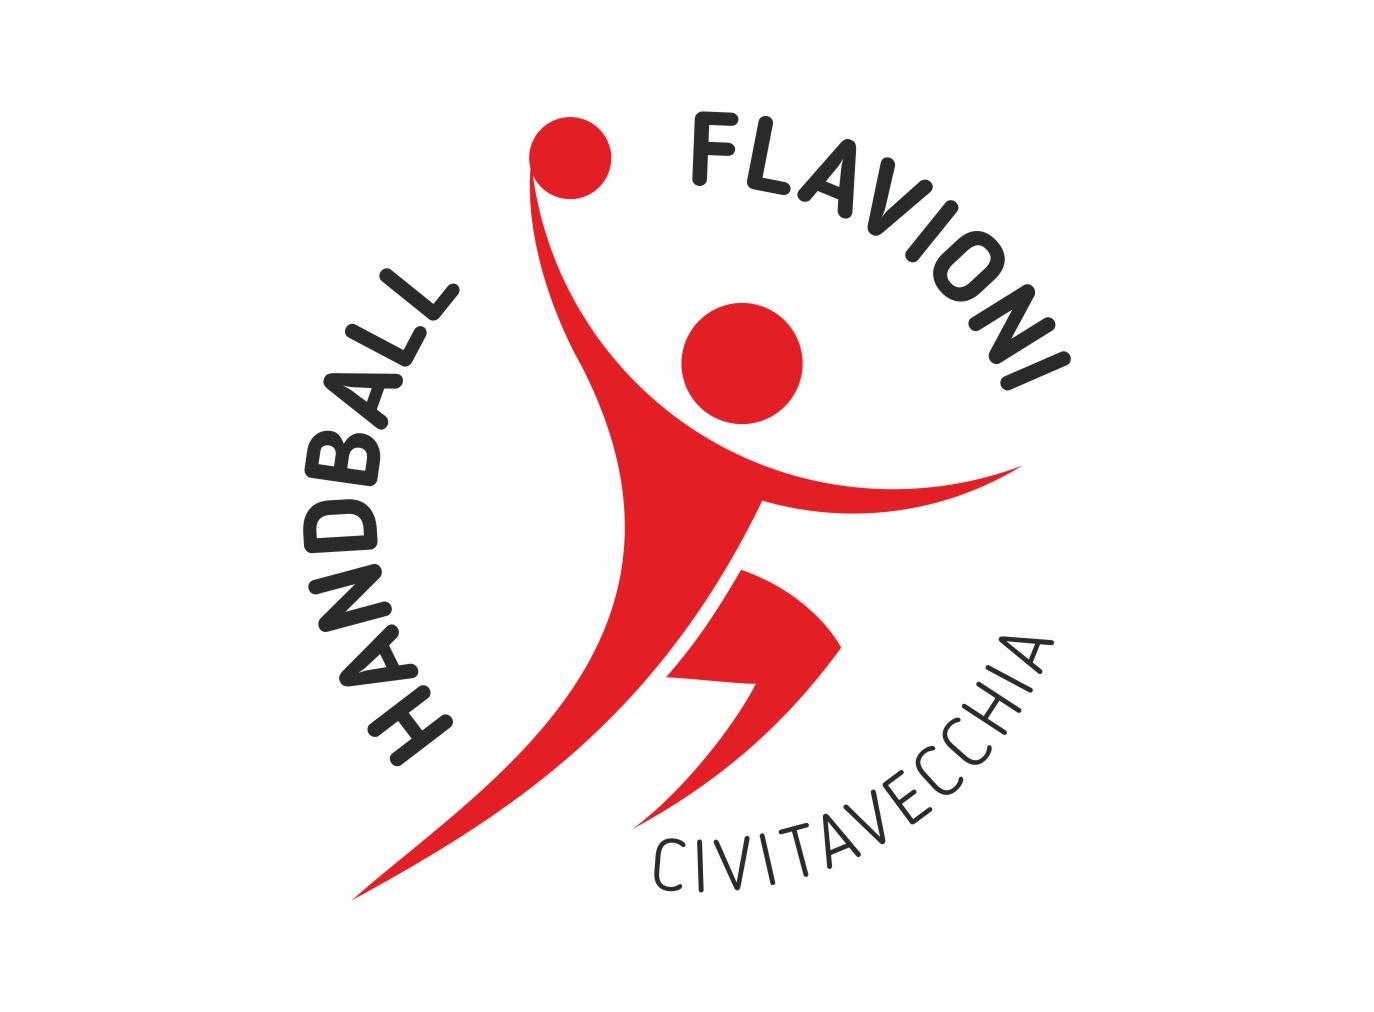 Handball Flavioni